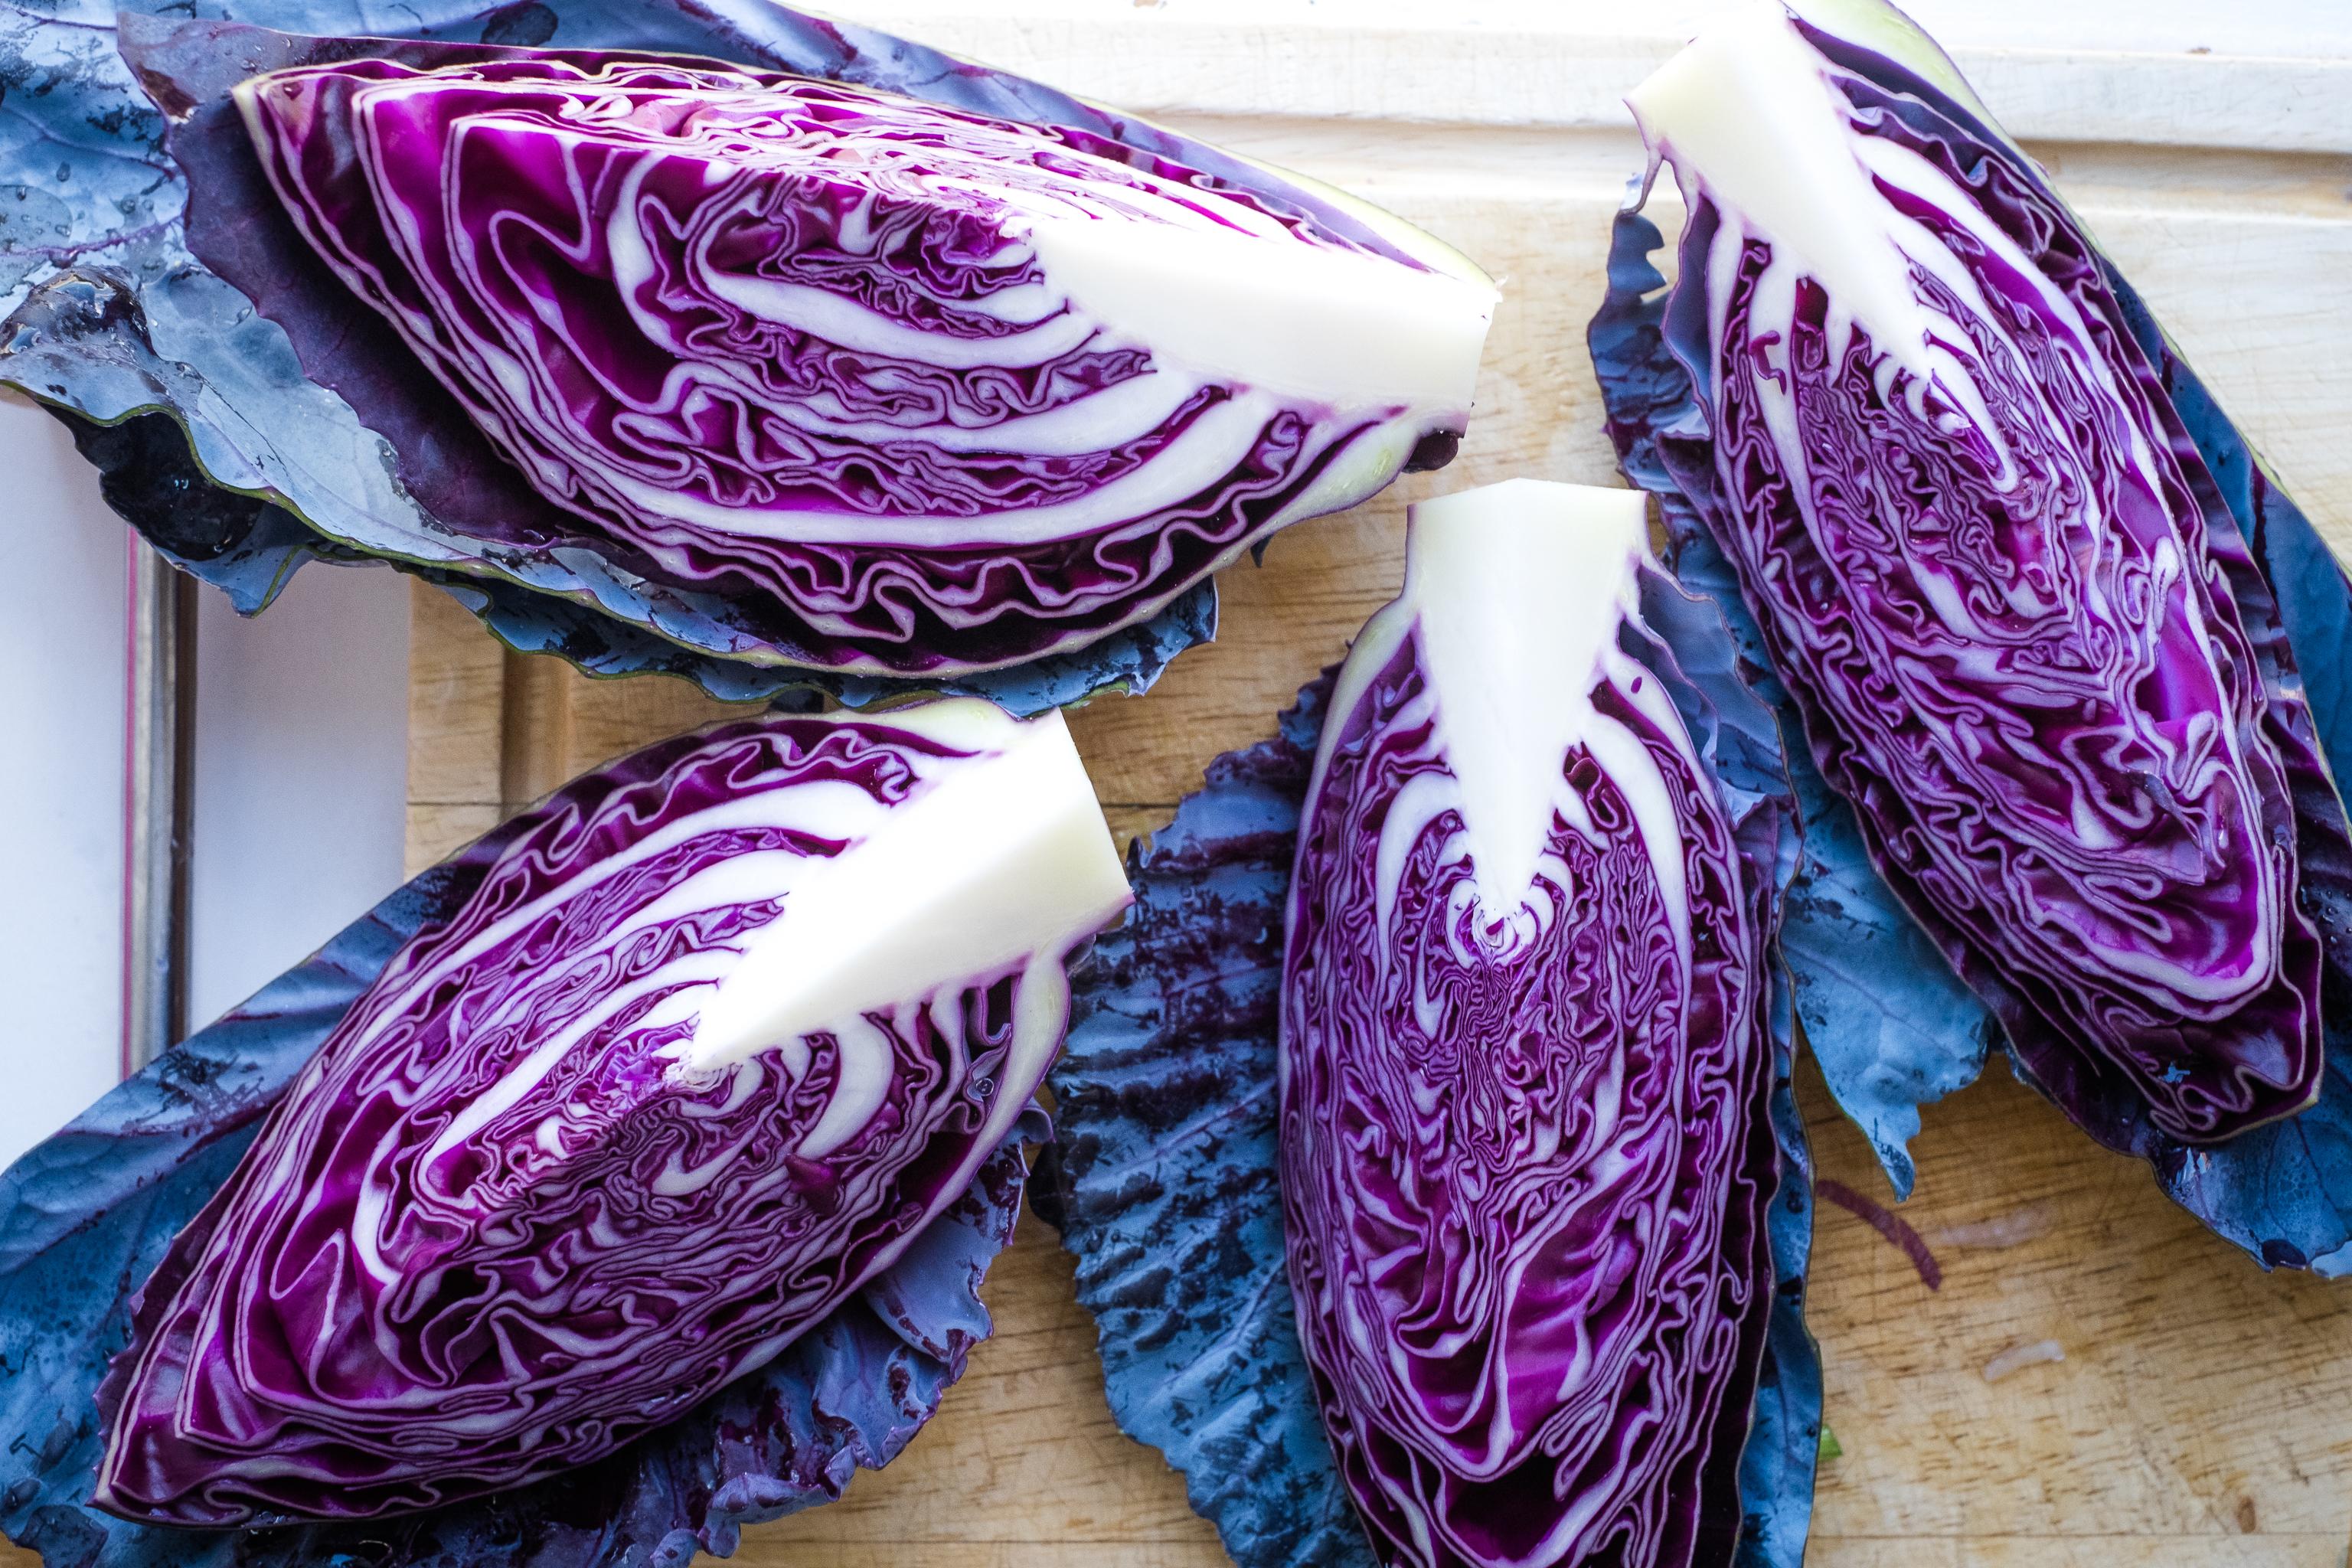 Danish cabbage